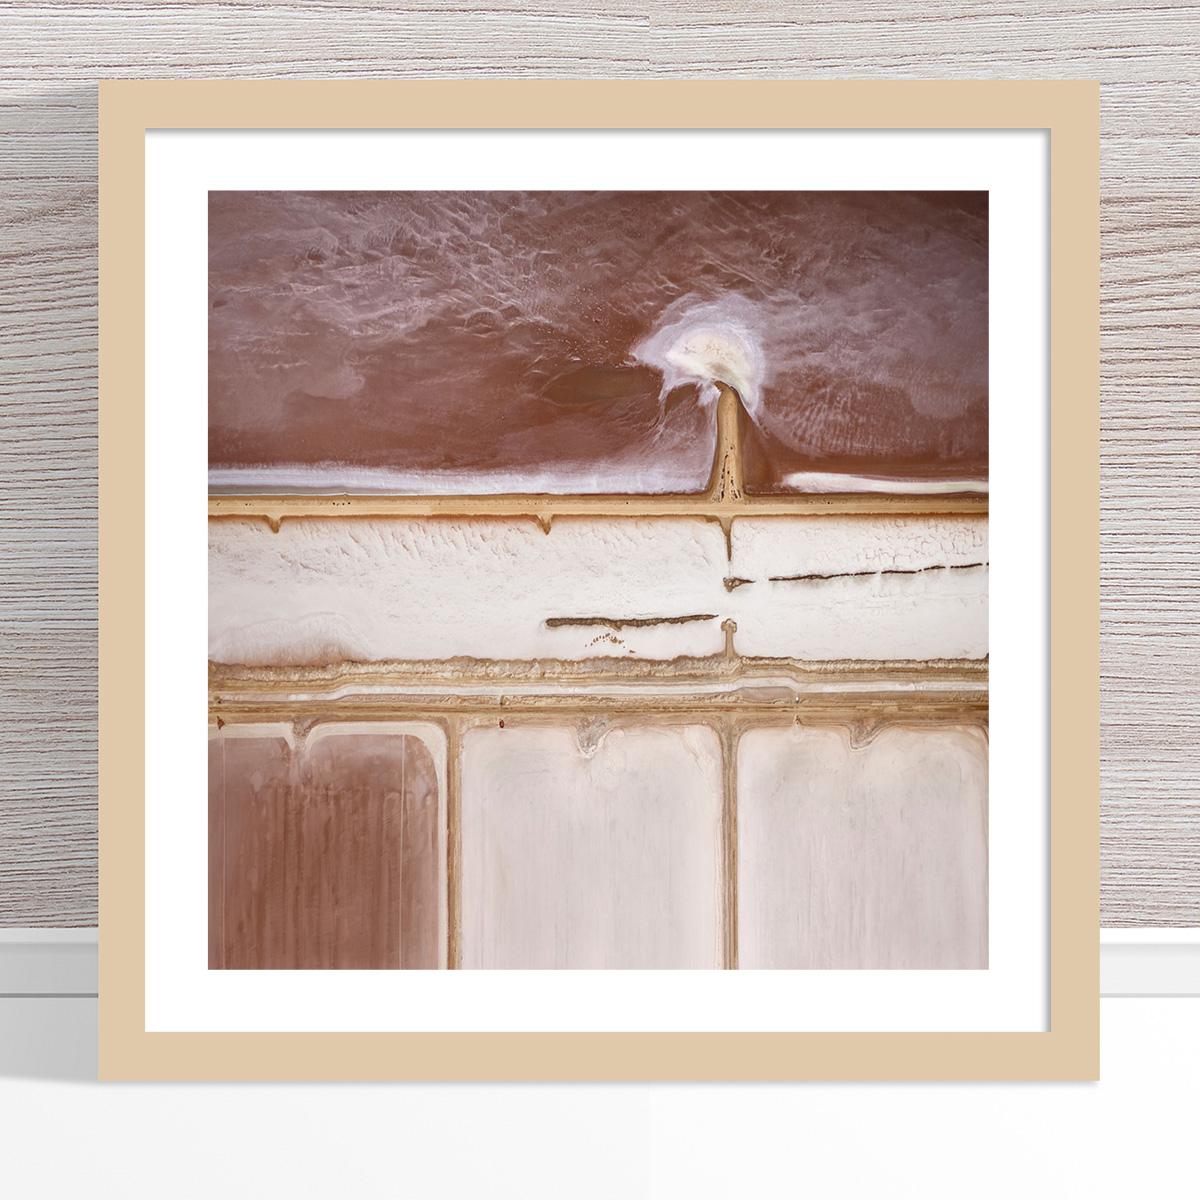 Chris Saunders - 'Aerial Salt 012' Light Frame